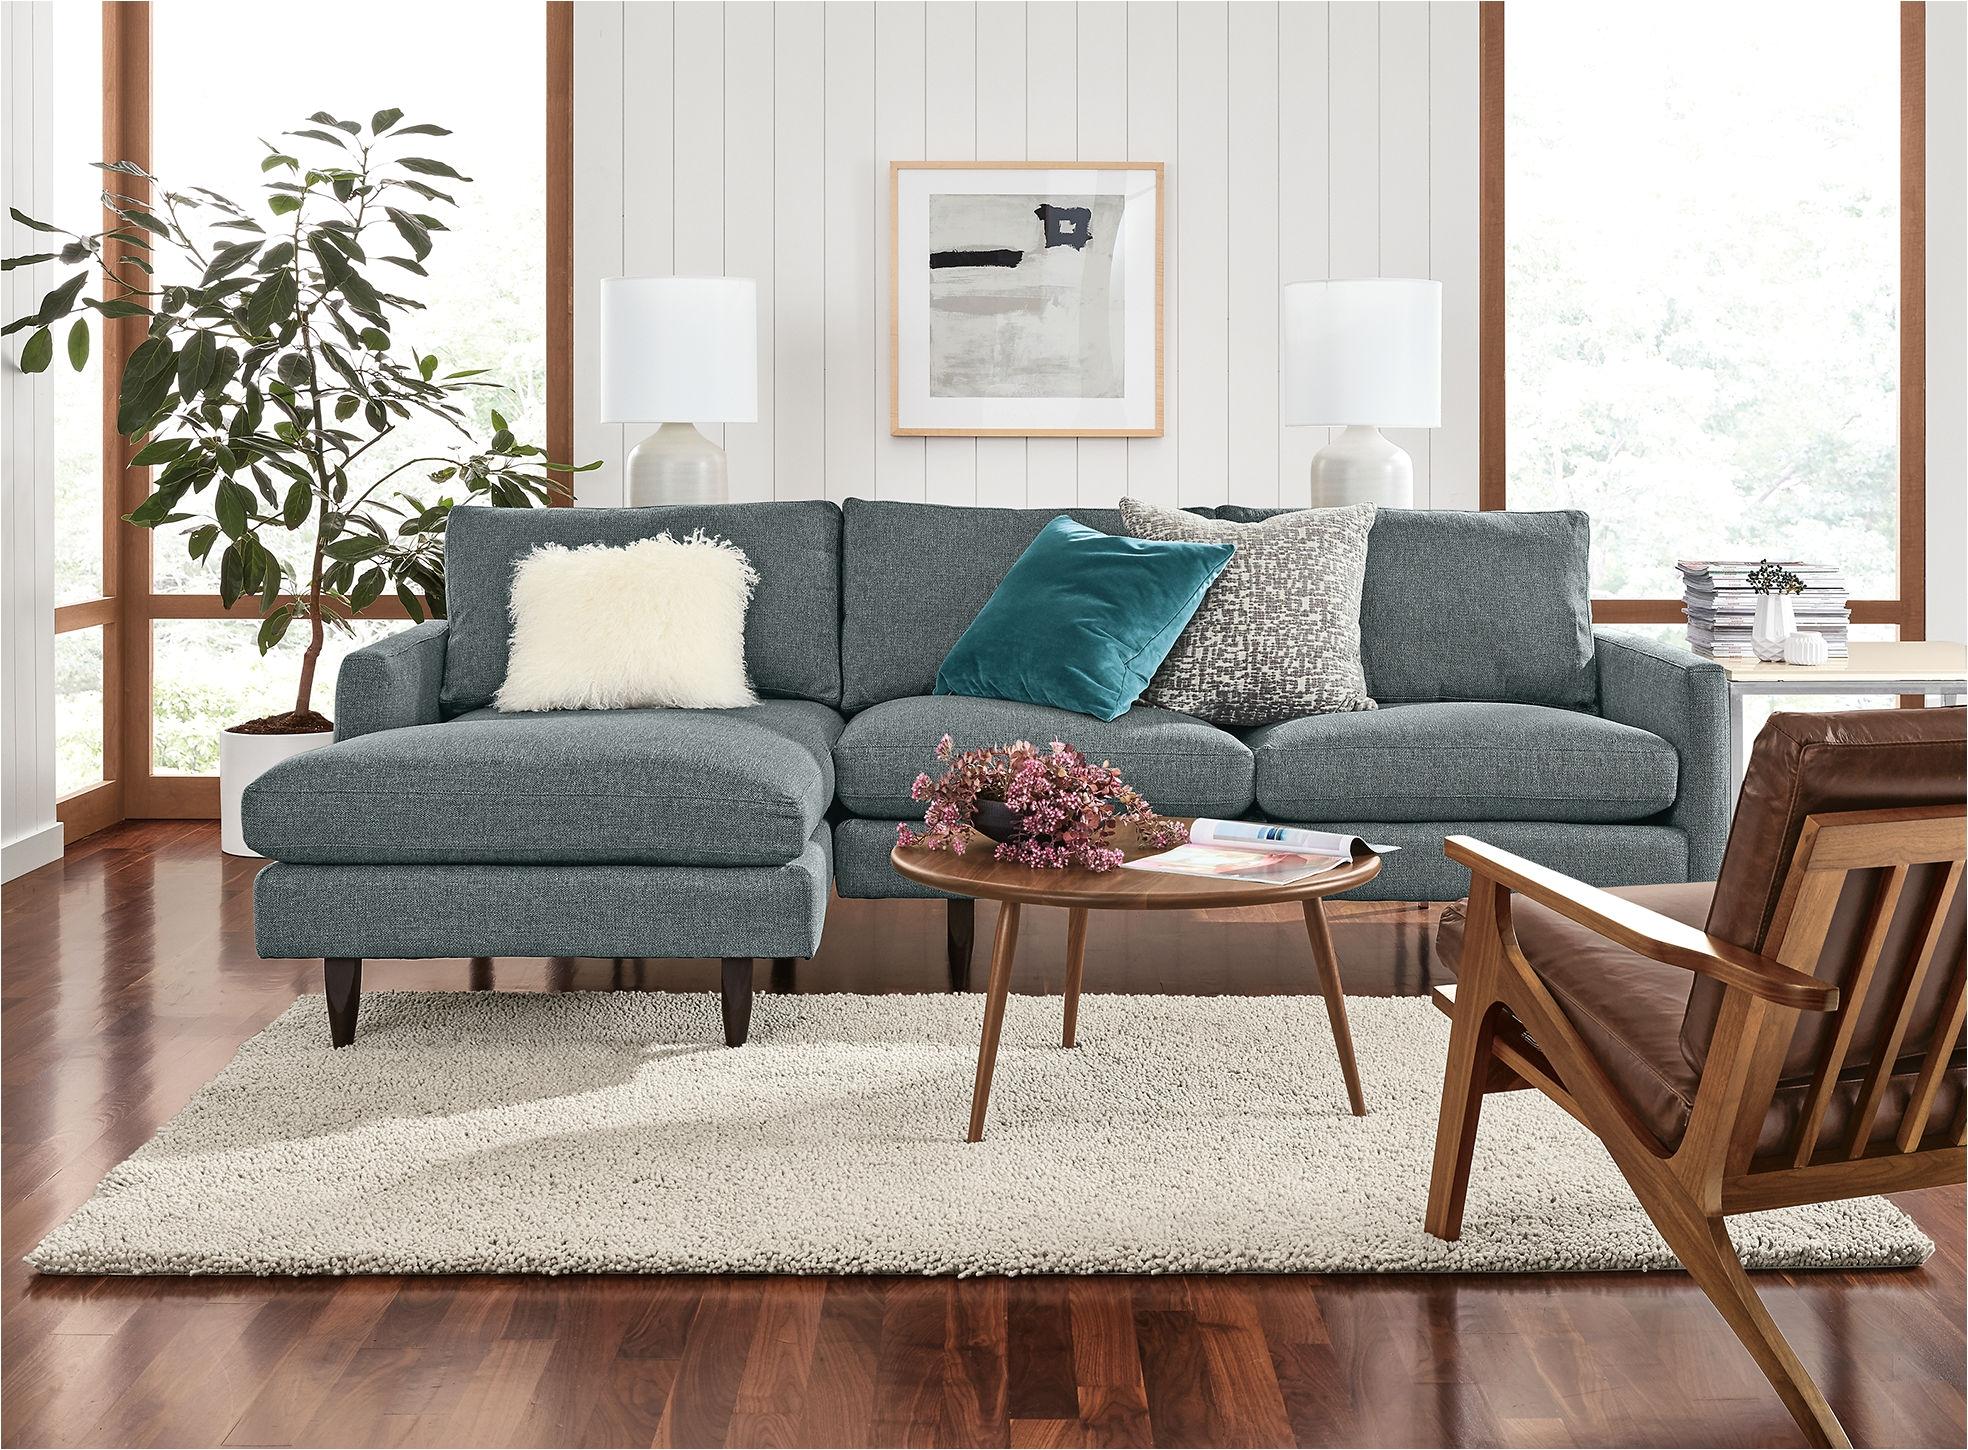 Designer Side Tables for Living Room Modern Living Room Furniture Living Room & Board